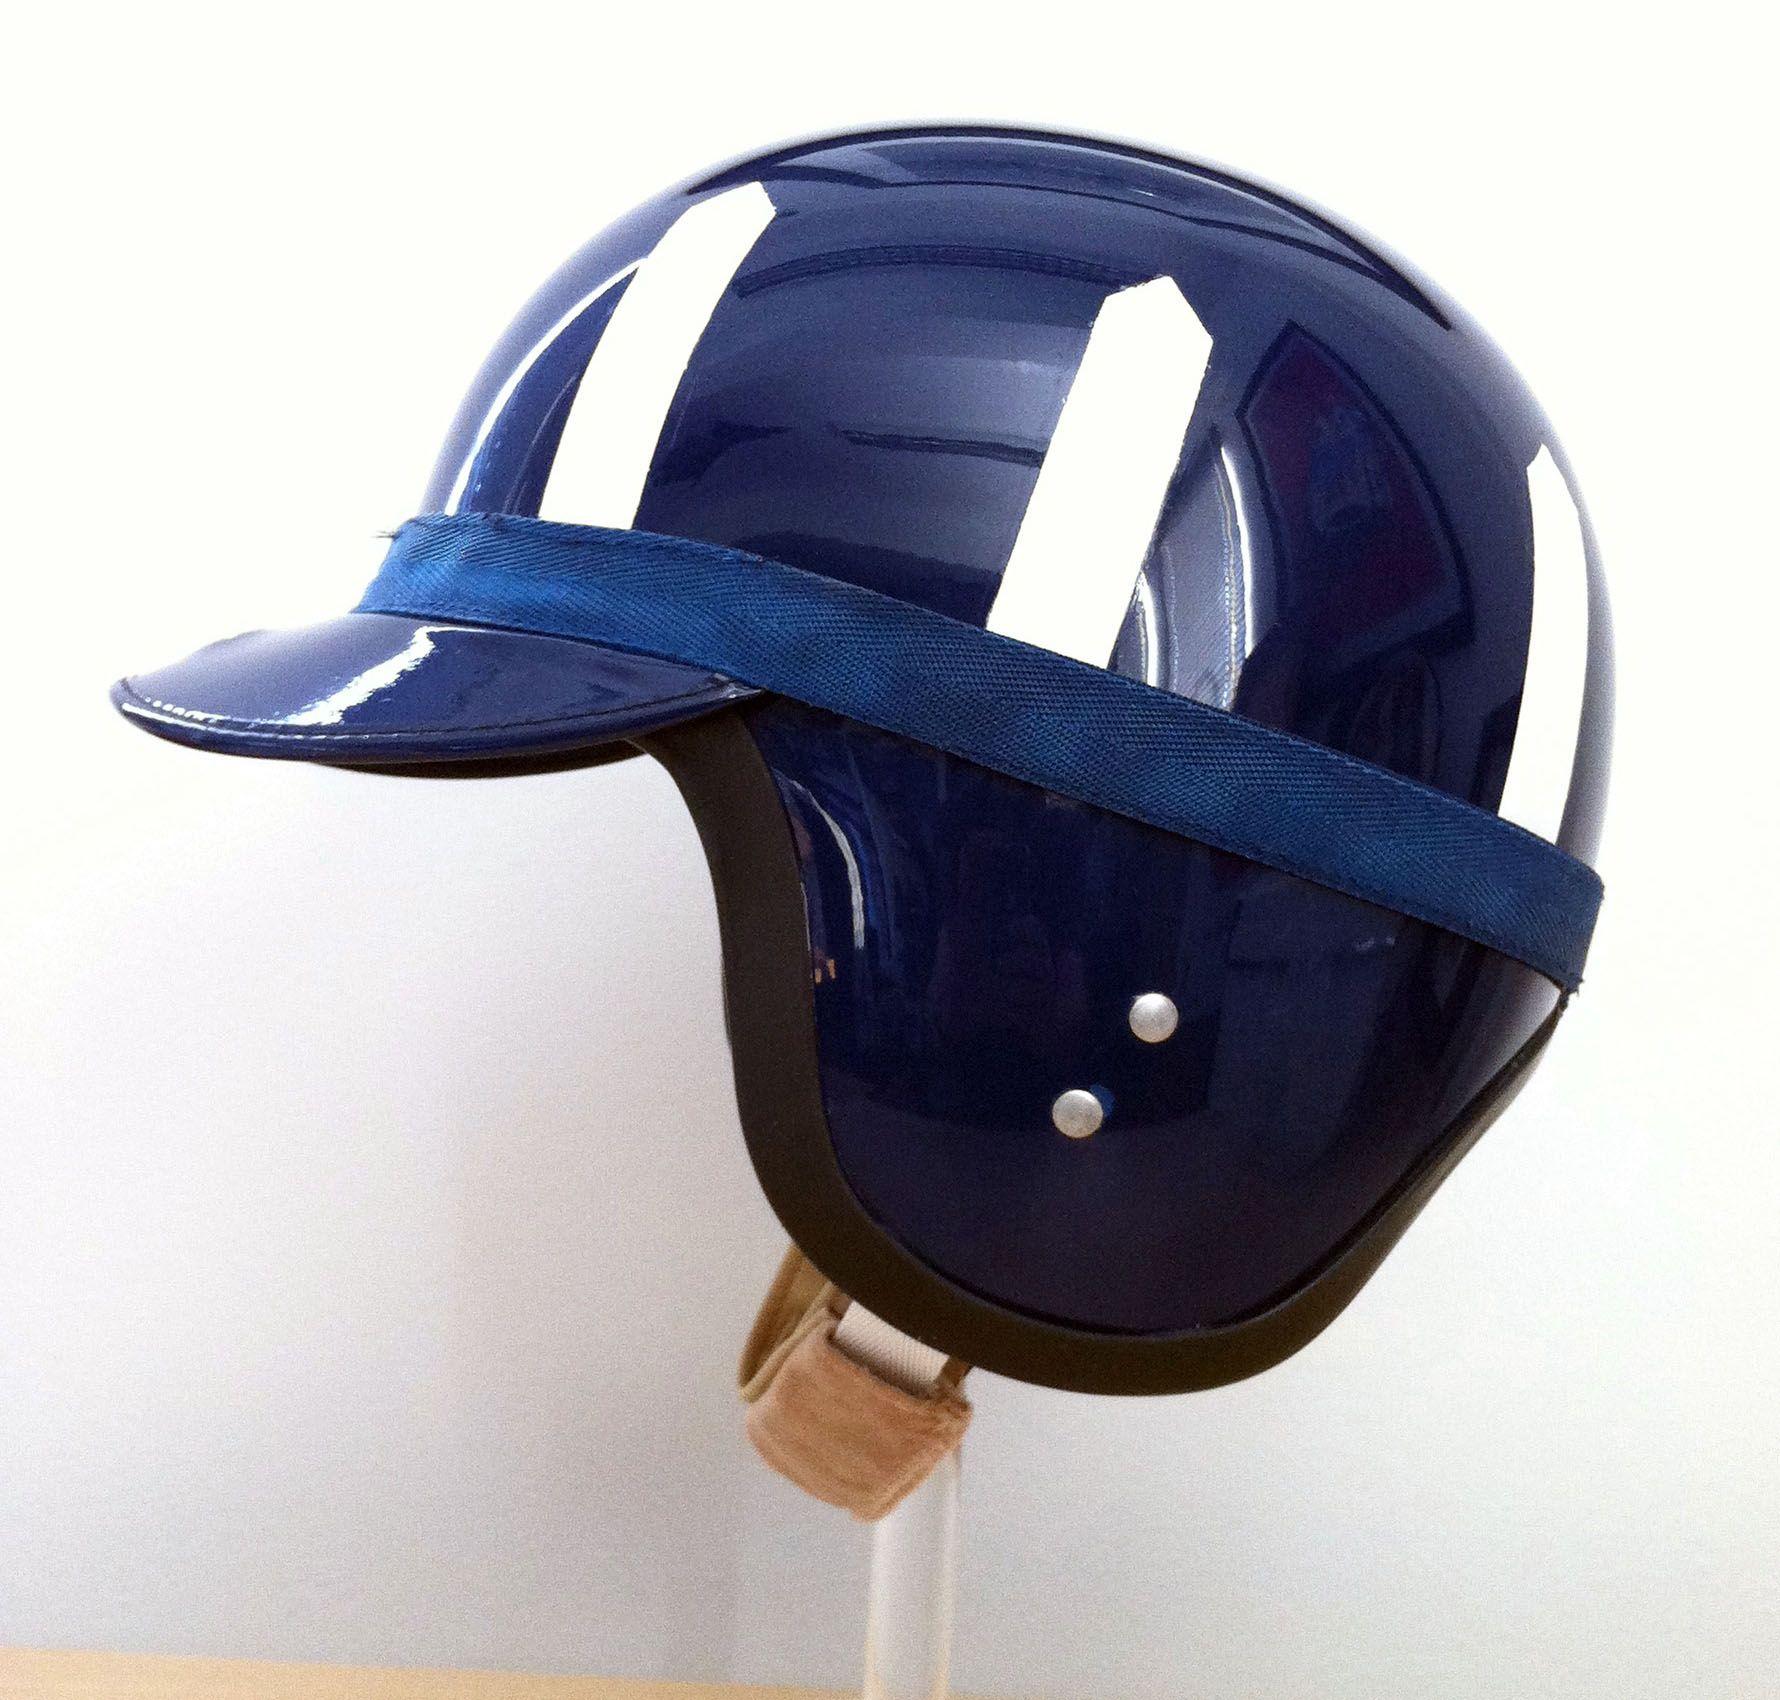 Pin by Huffy on helmets Helmet, Helmet design, Riding